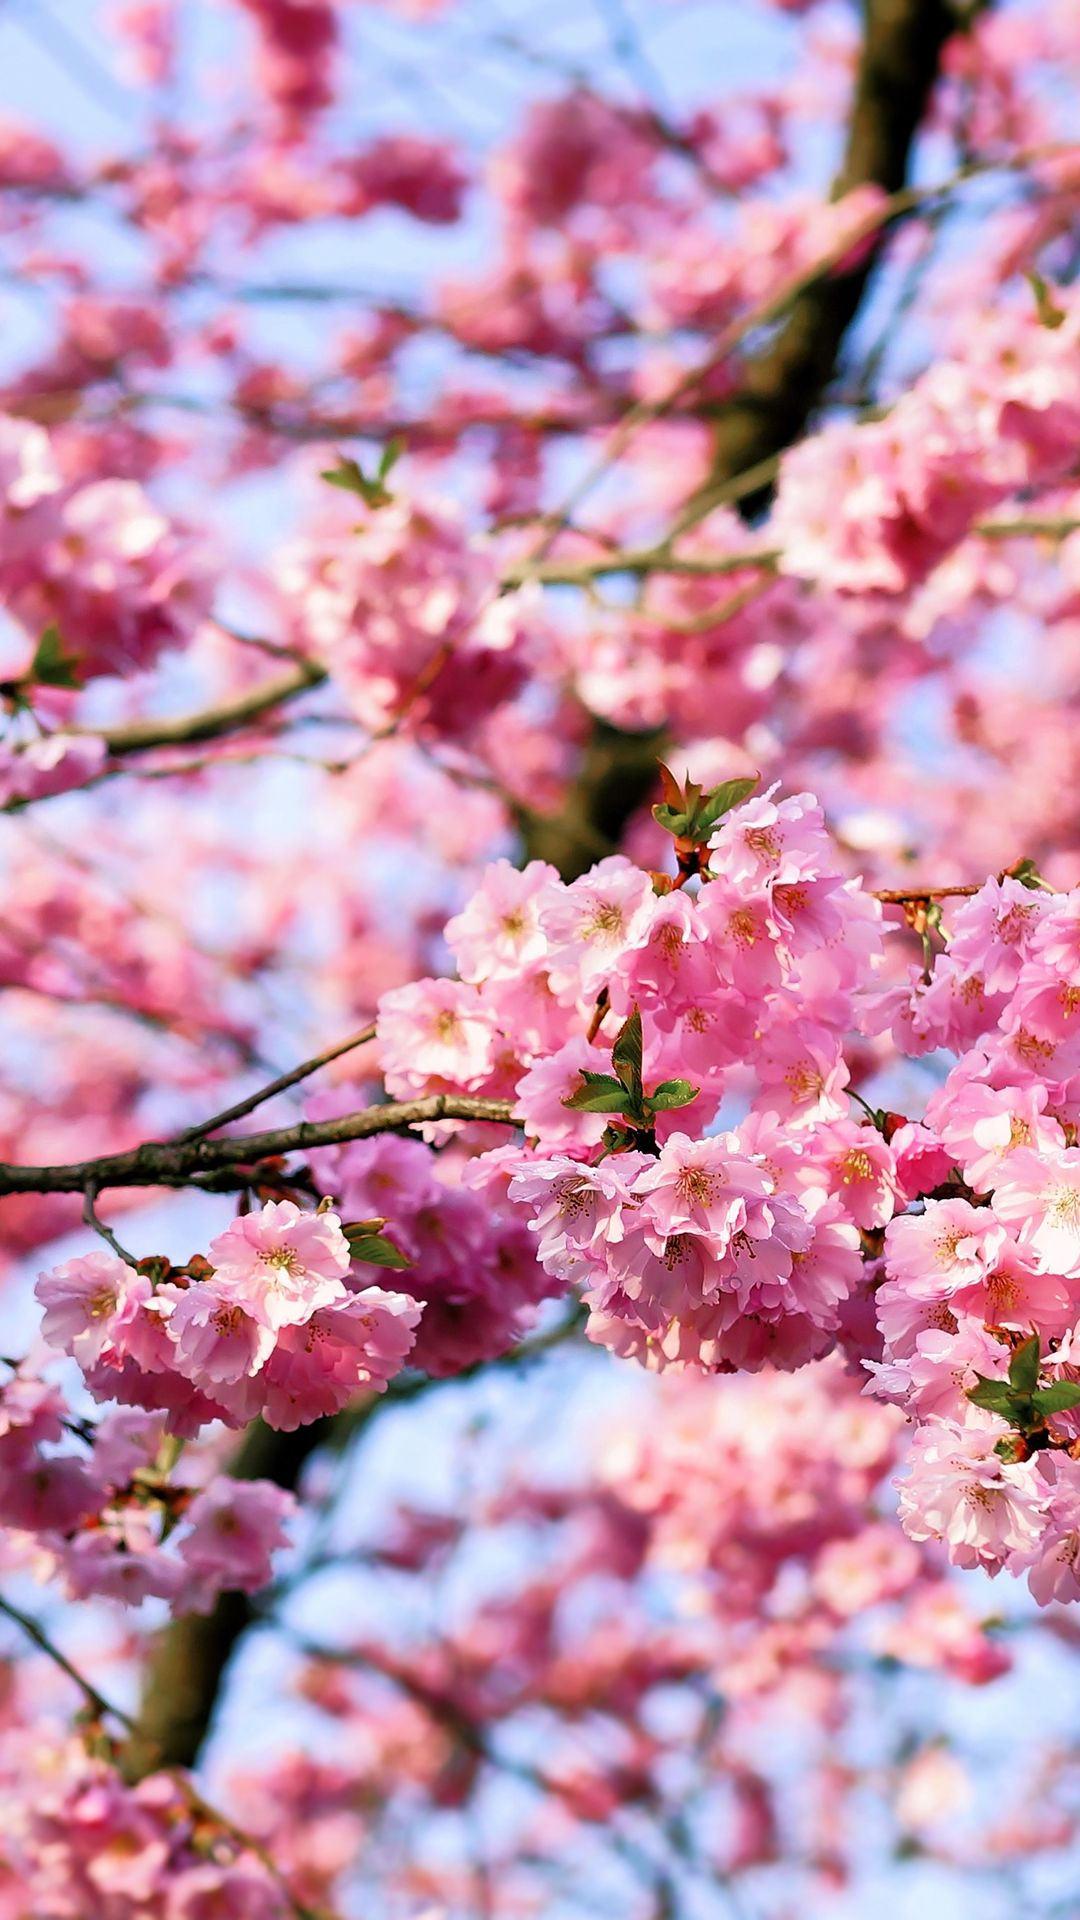 Cherry Blossom Iphone 1080x1920 Cherry Blossom Tree Pink Nature Blossom Trees